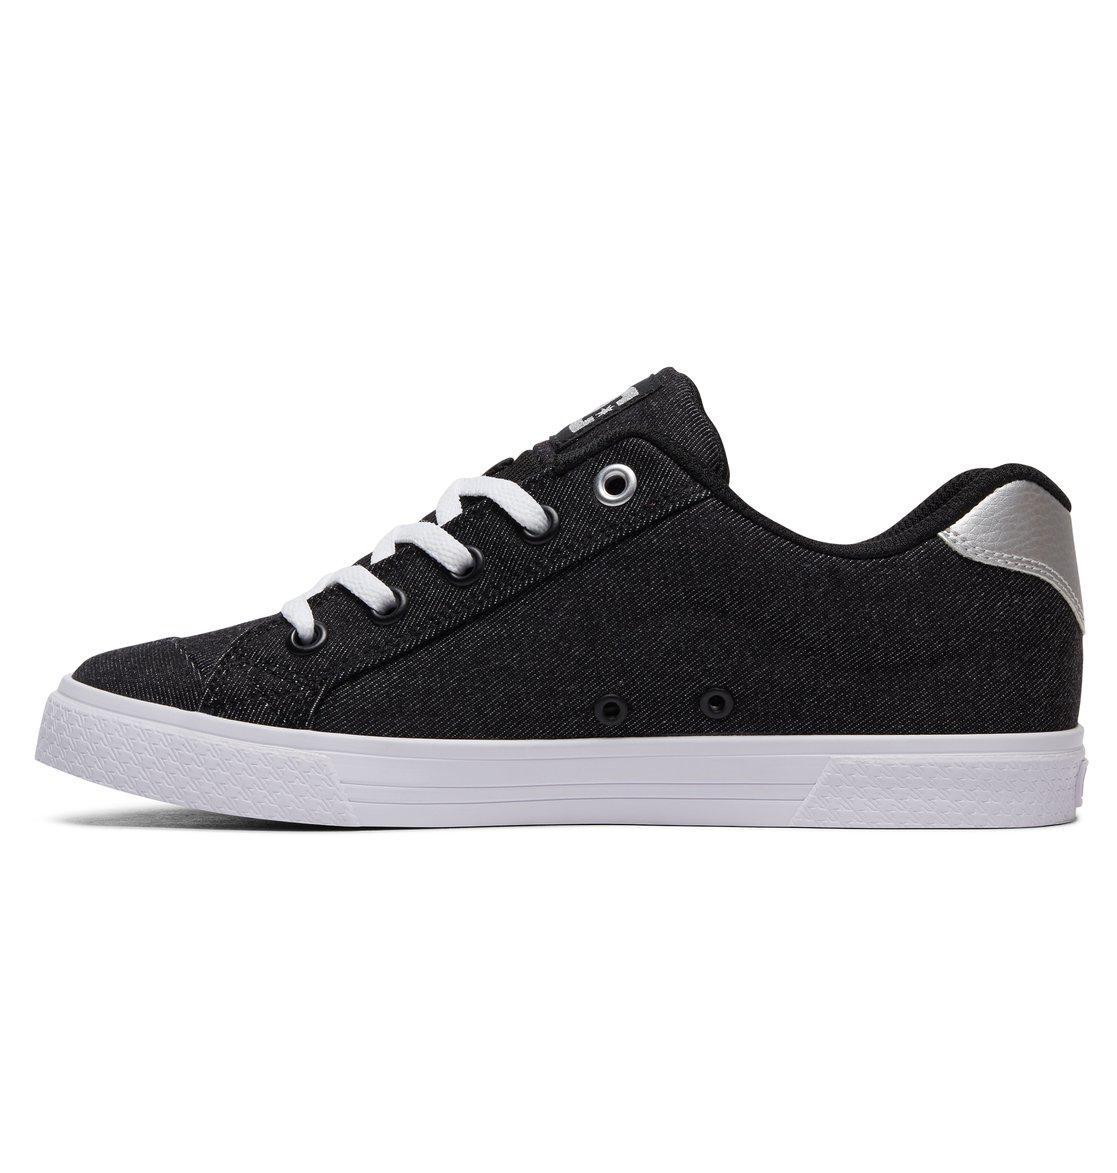 Chaussures DC Shoes Heathrow SE noires Casual fille